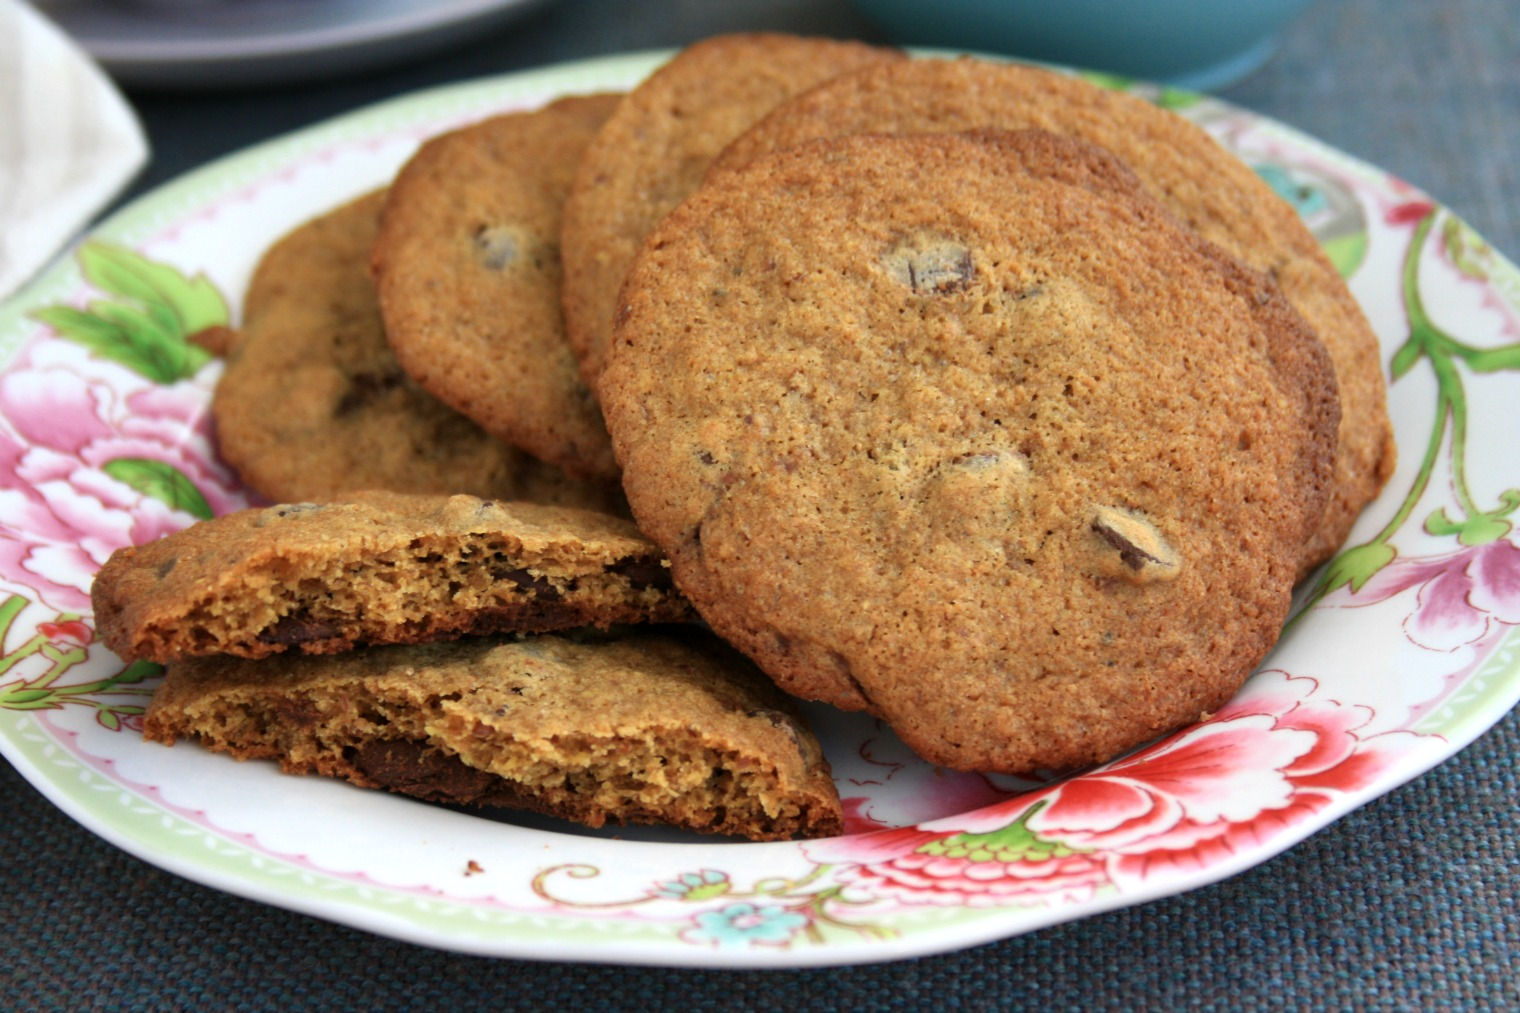 Healthier Molasses Chocolate Chip Cookies - Grandma Molasses